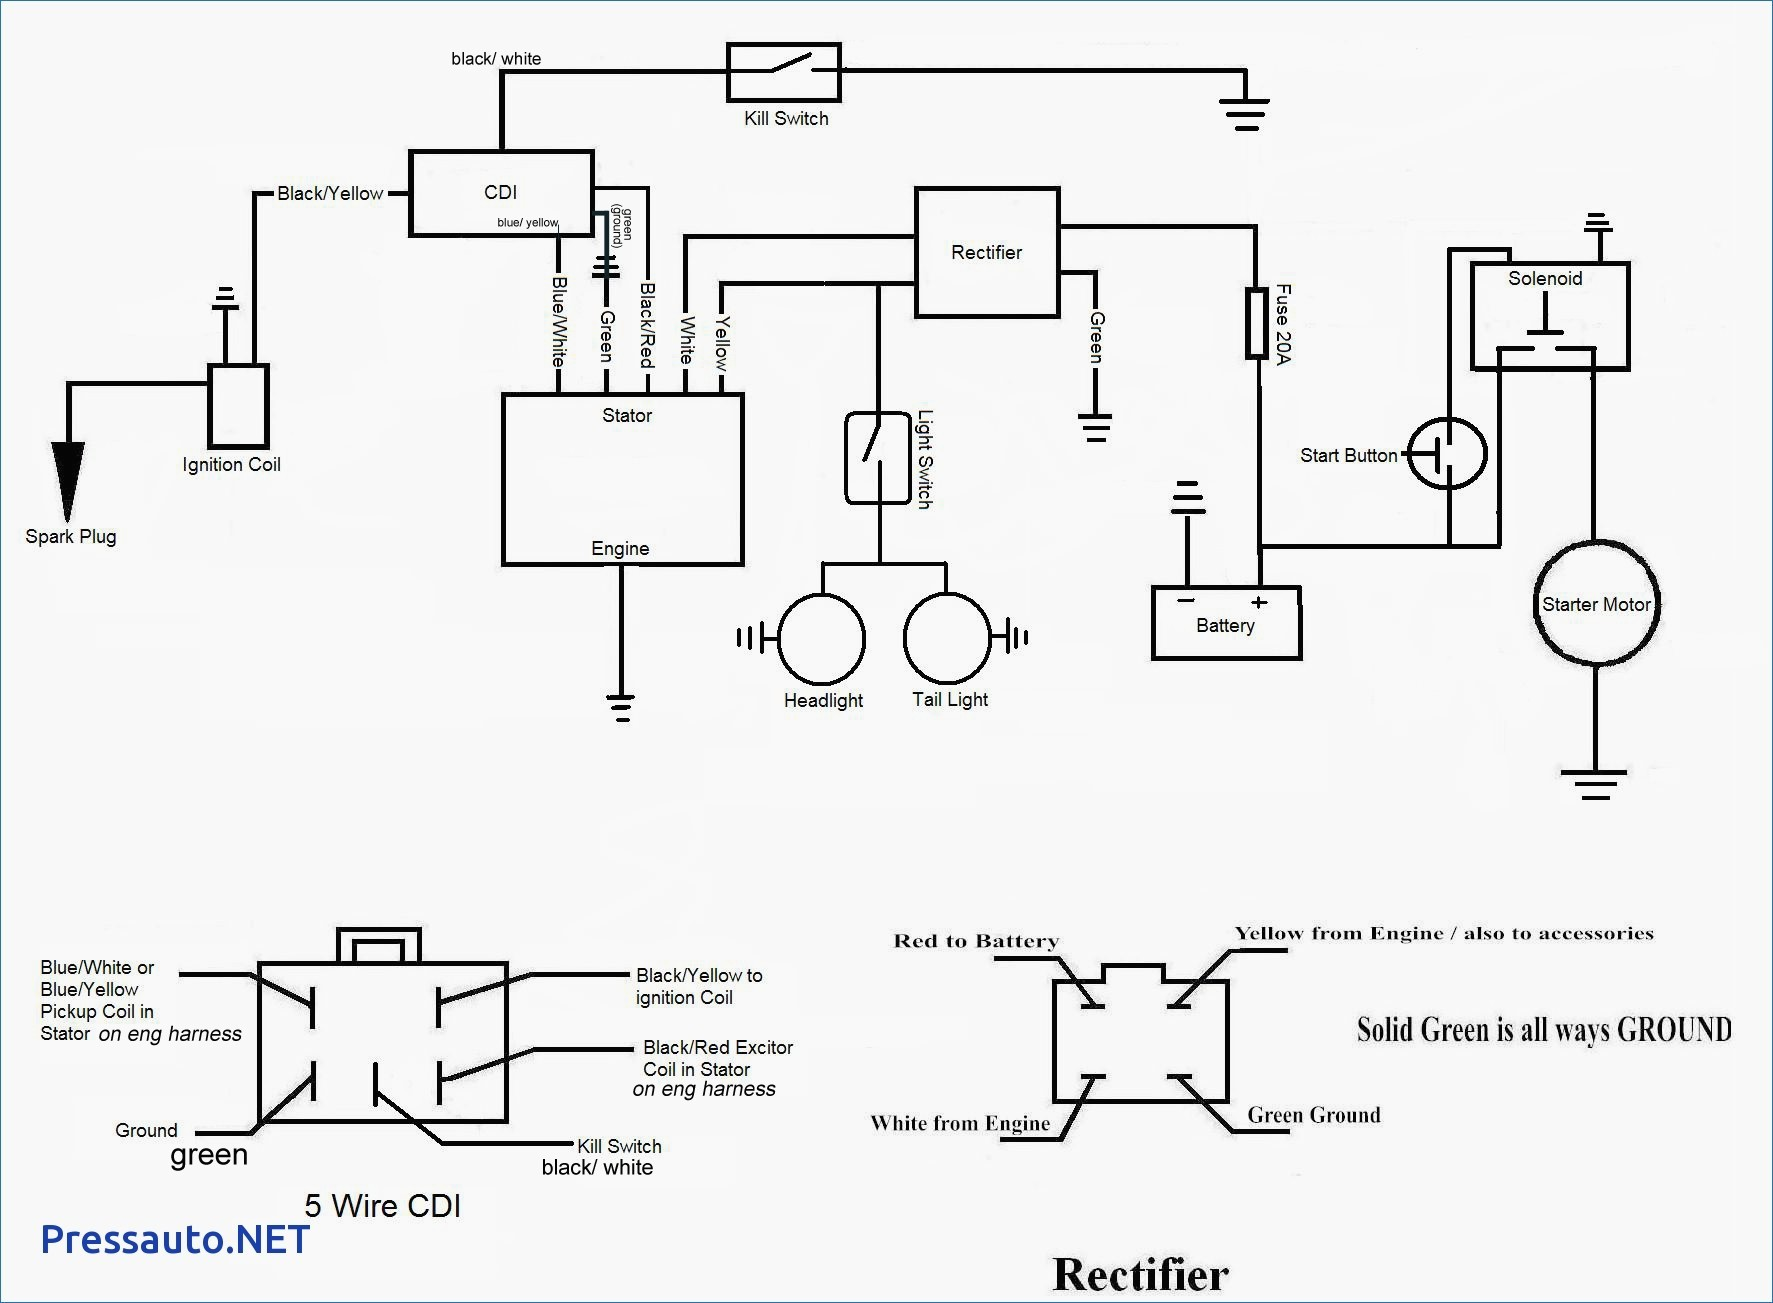 lifan pit bike wiring harness conversion